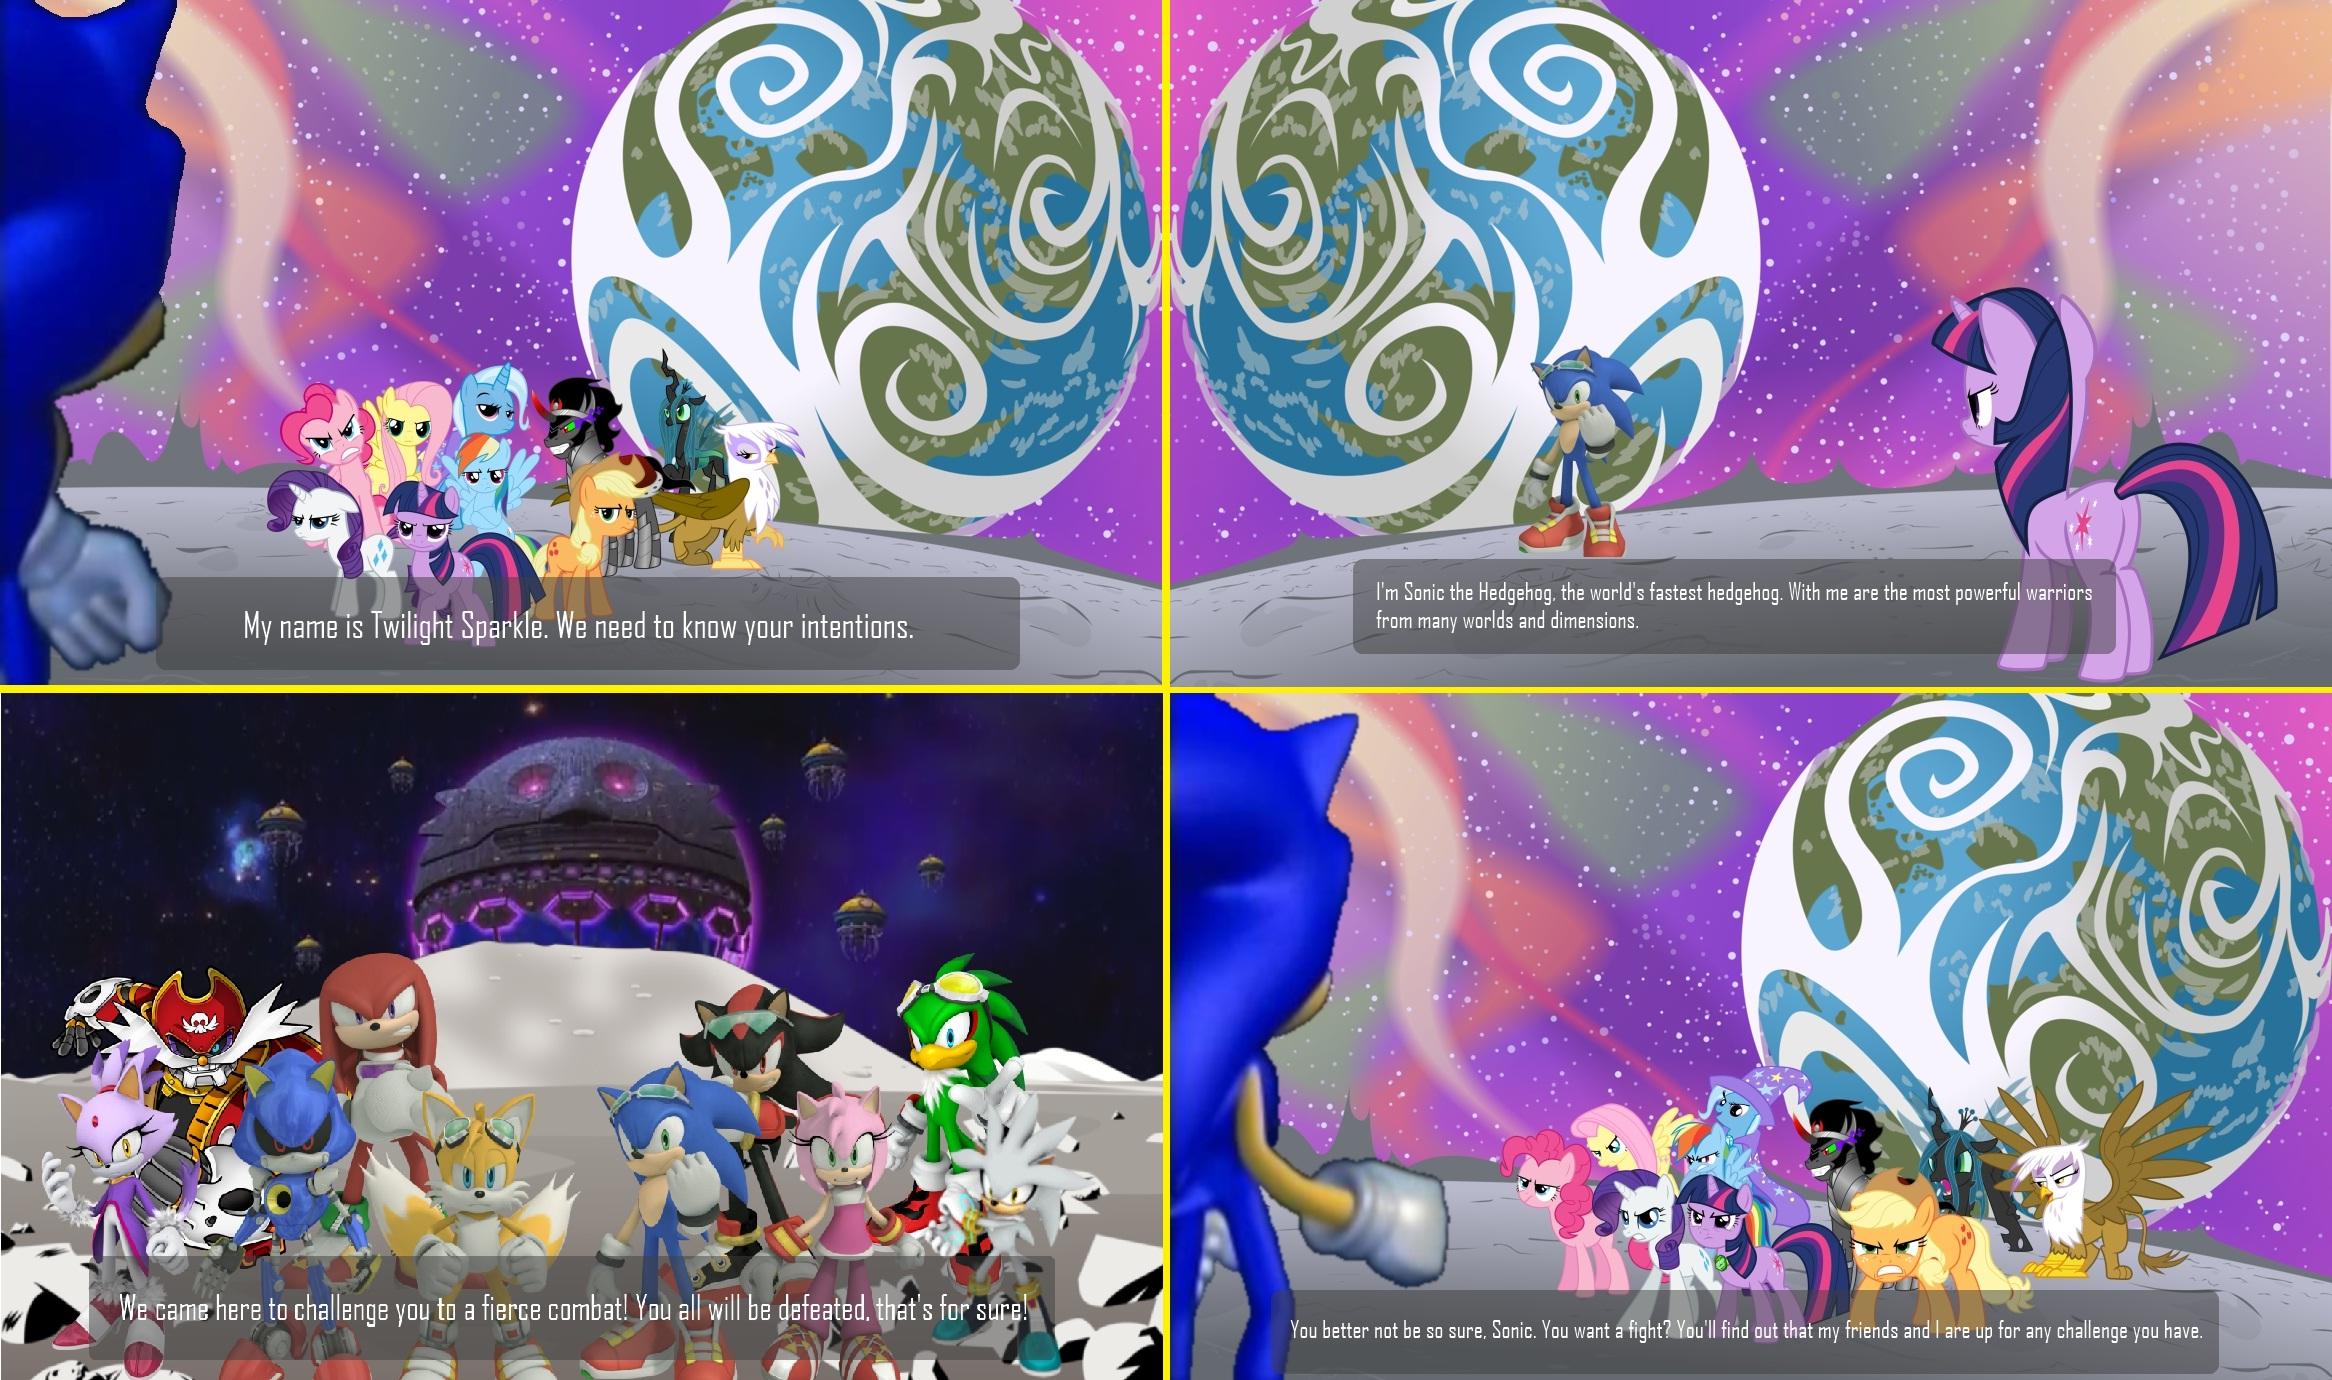 Sonic The Hedgehog Vs My Little Pony By Bvge On Deviantart